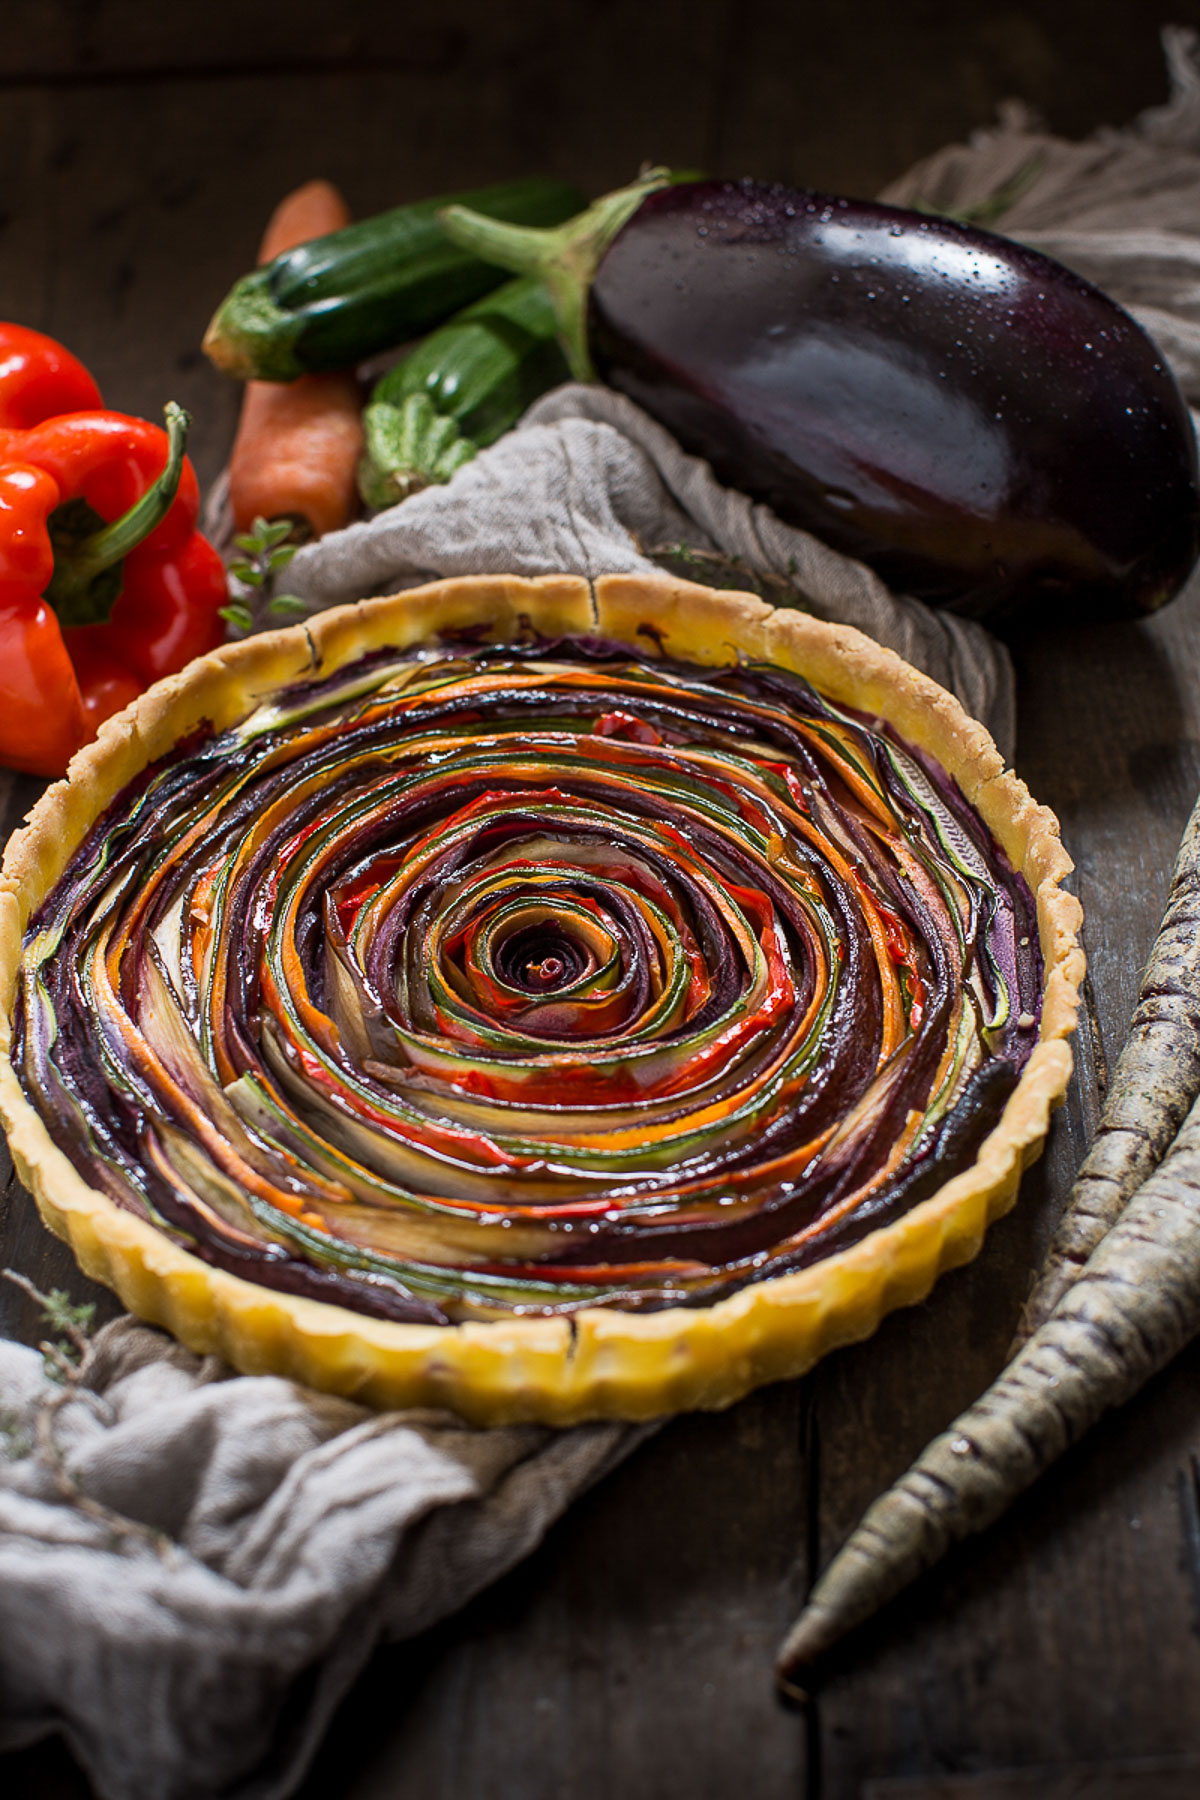 torta salata di verdure a spirale senza glutine senza uova senza burro #vegan ricetta | vegan #glutenfree vegetable spiral tart recipe